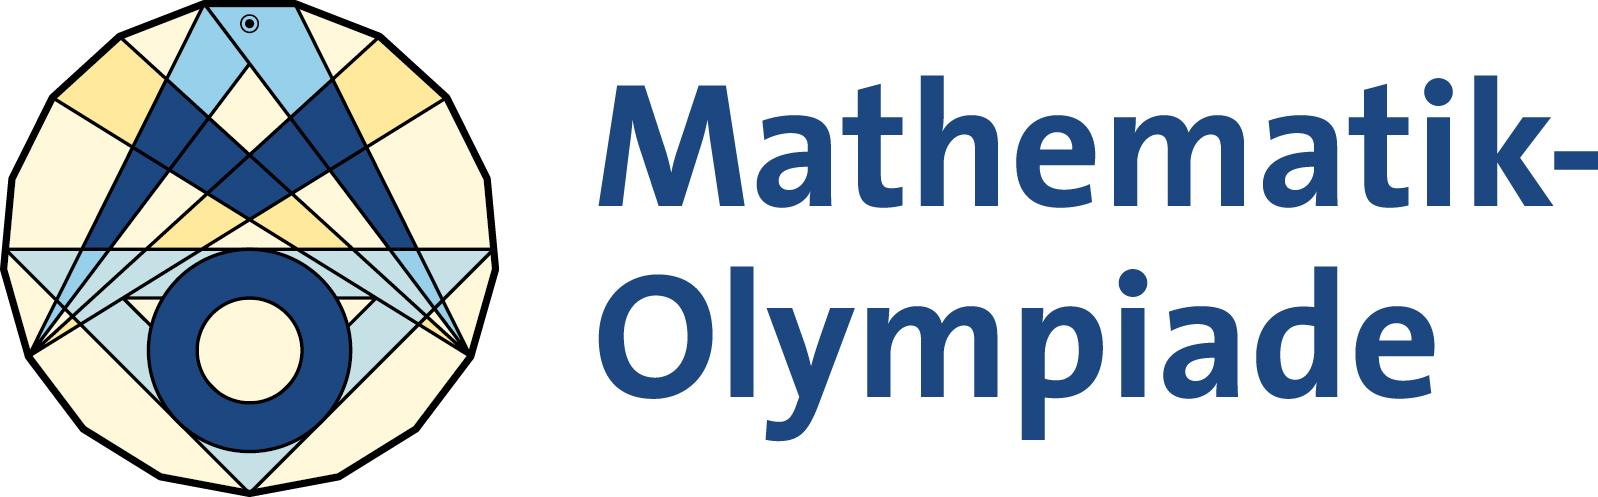 59. Mathematik-Olympiade - Müritzportal